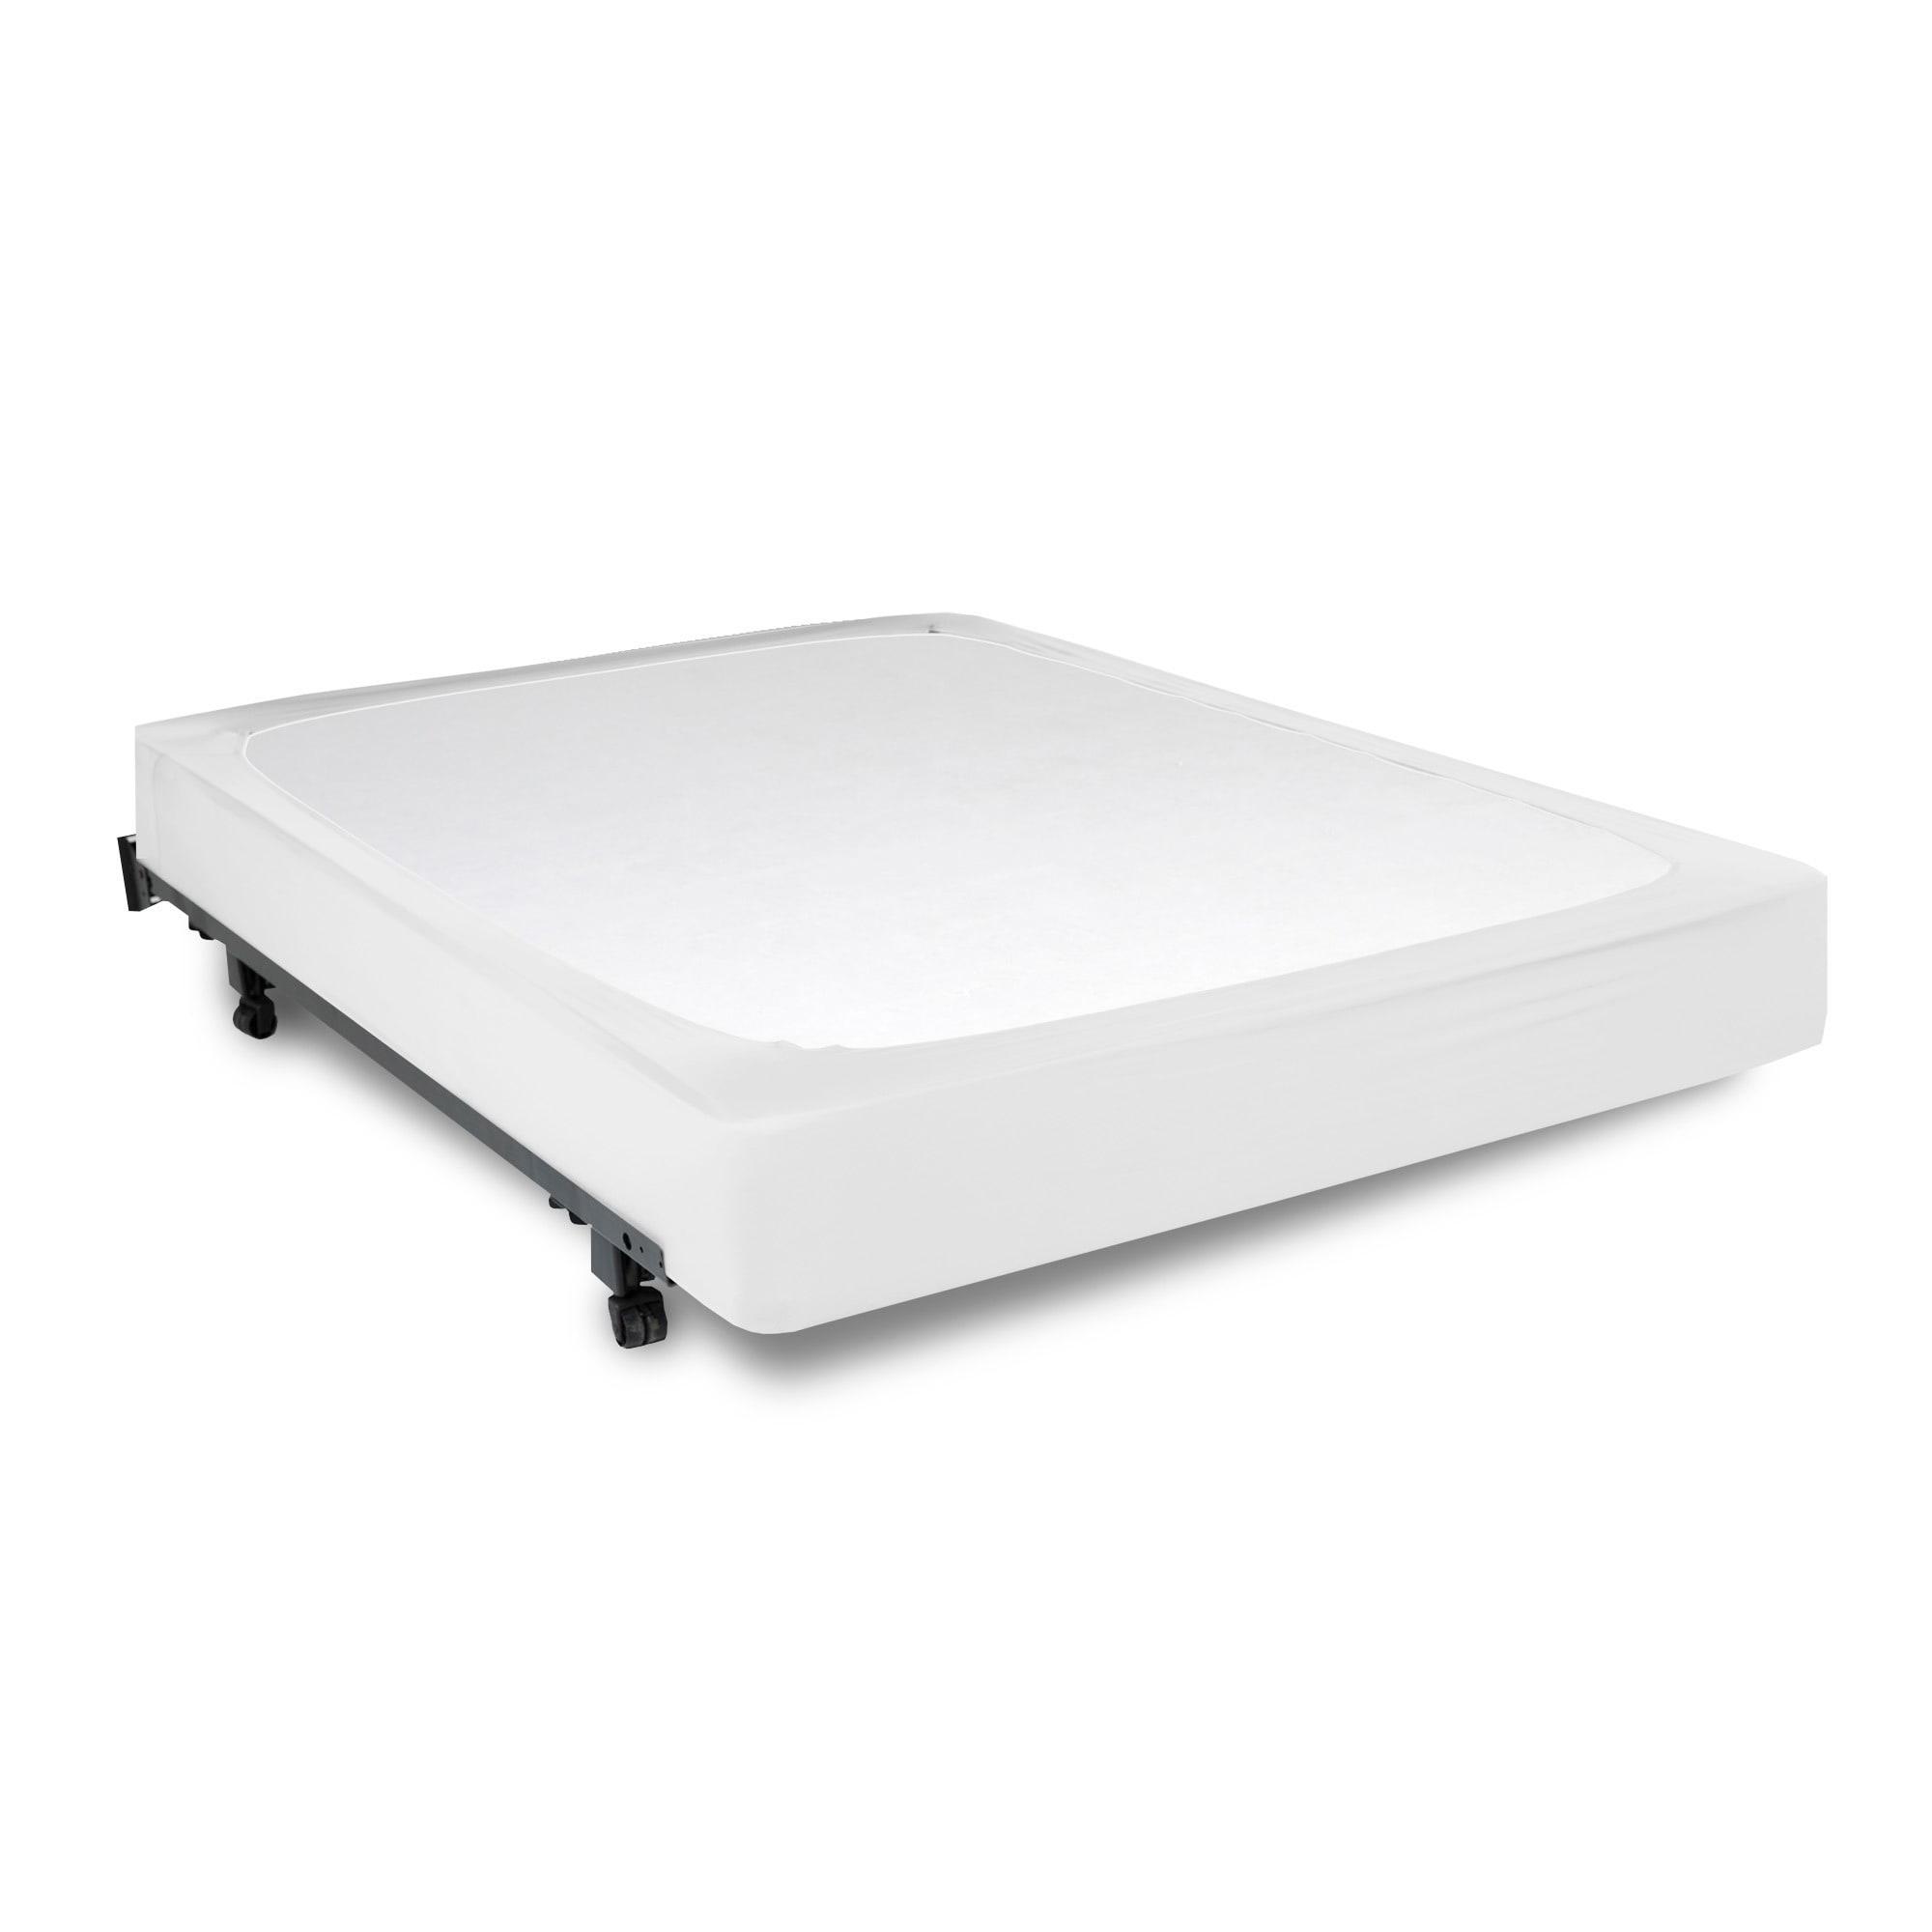 Fashion Bed Group Sleep Plush StyleWrap White Fabric Box ...